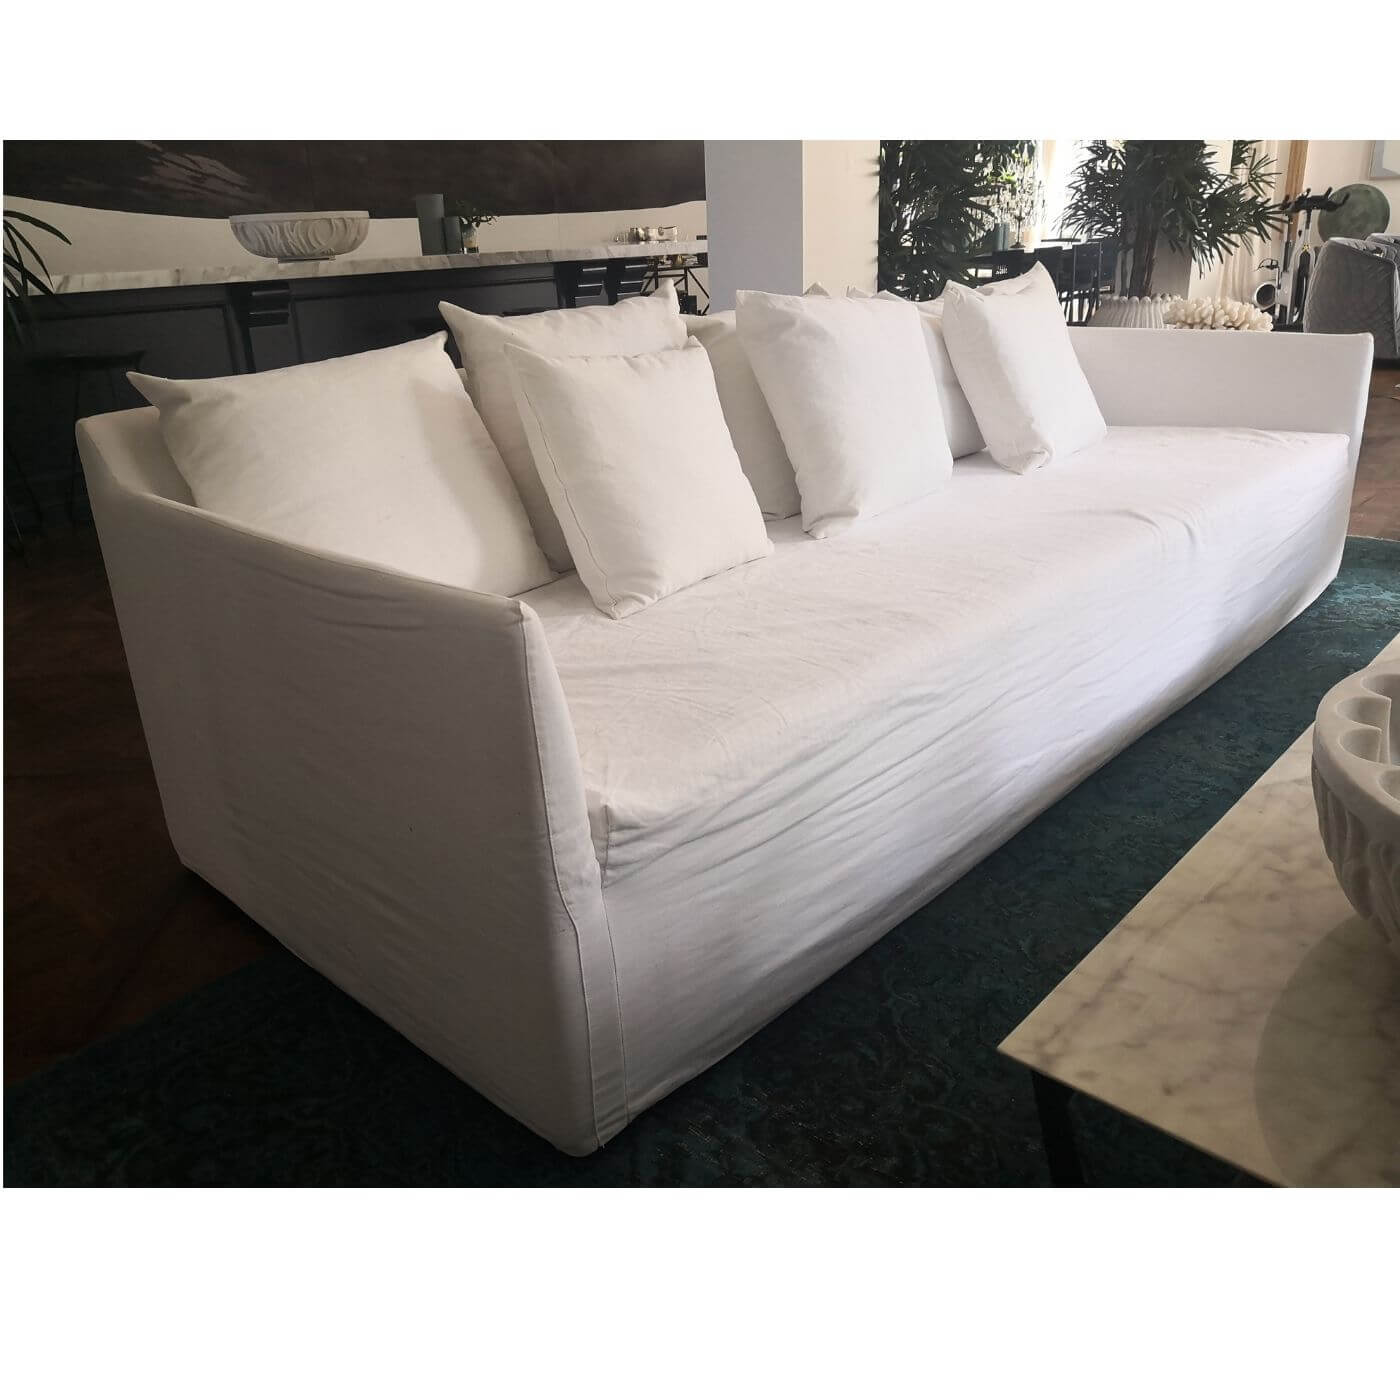 MCM House Joe Sofa in white, second hand